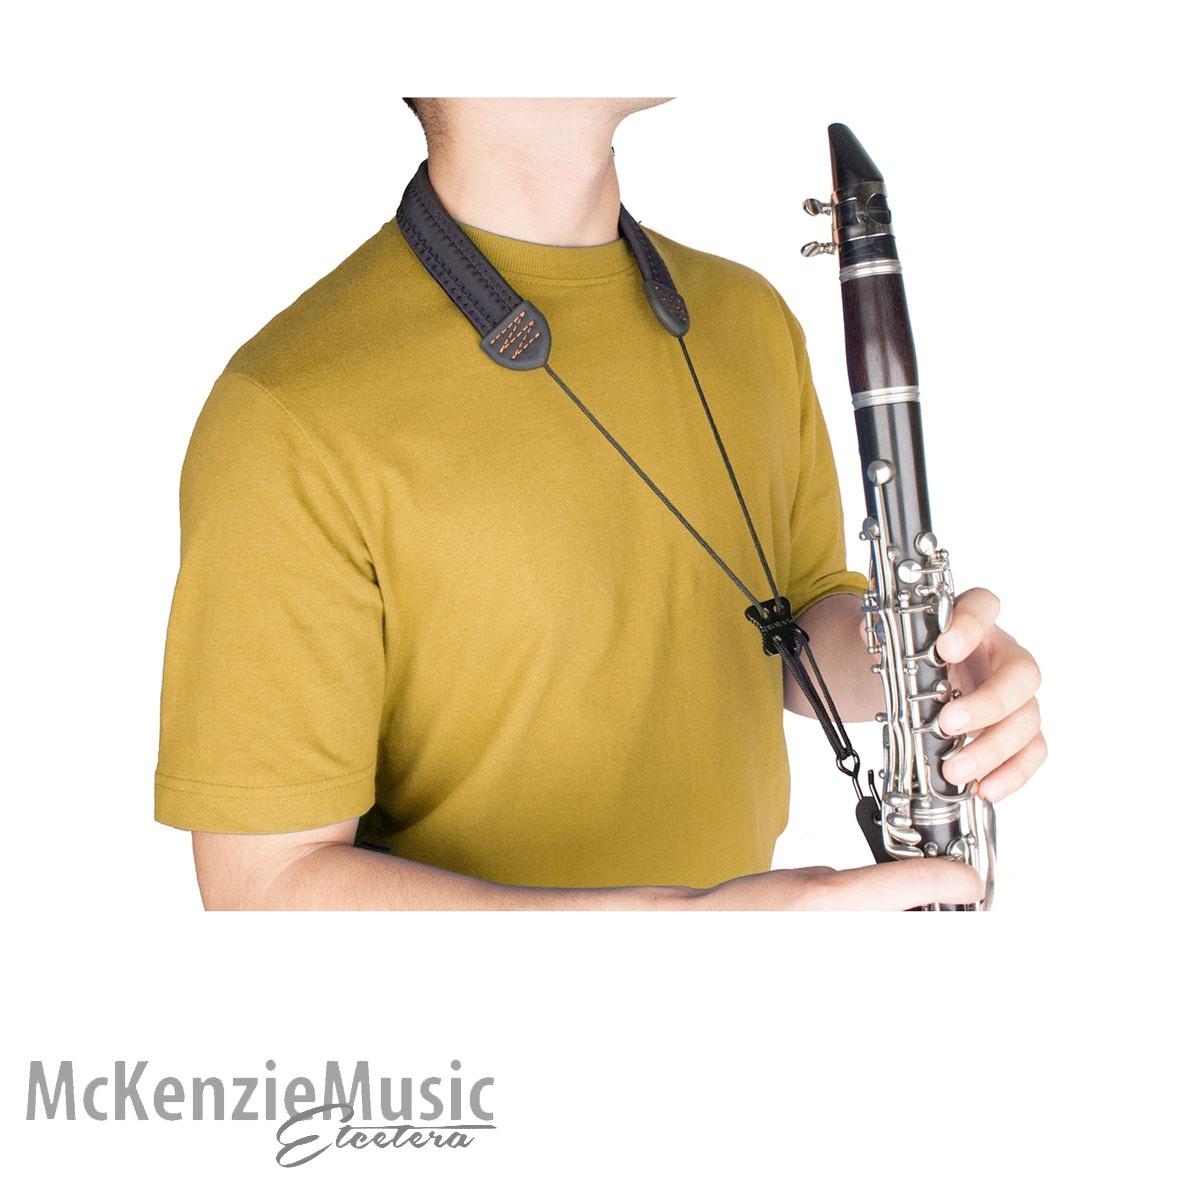 Protec Clarinet Neck Strap-Non-Elastic